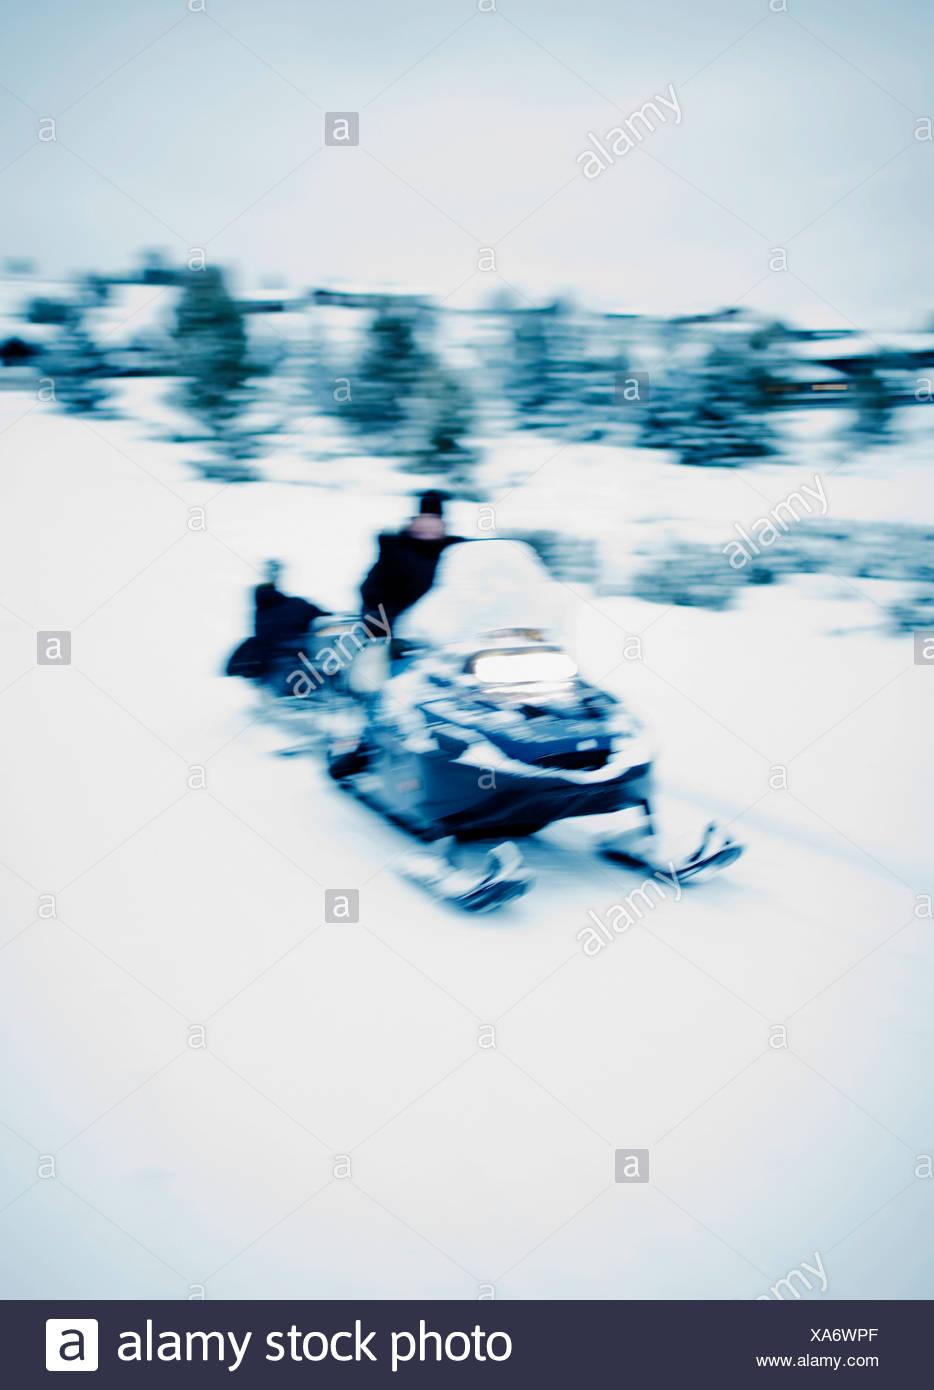 Man on snowmobile - Stock Image